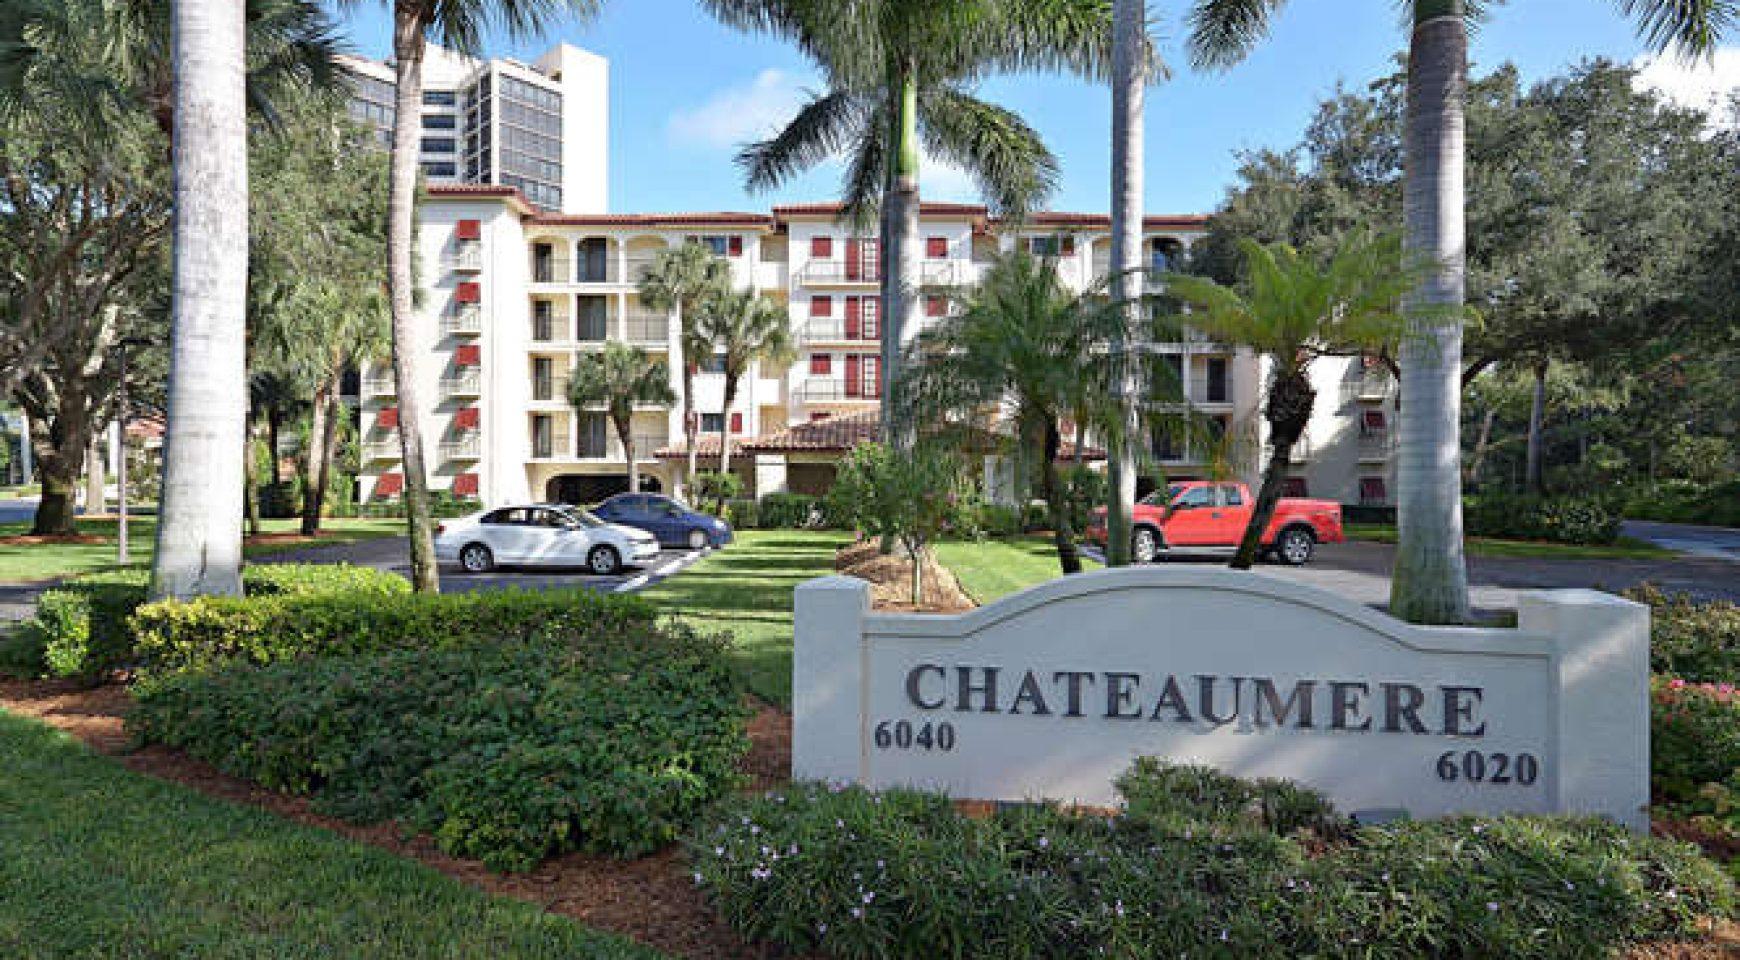 Chateaumere #E-302 – 6020 Pelican Bay Boulevard – Dustin J